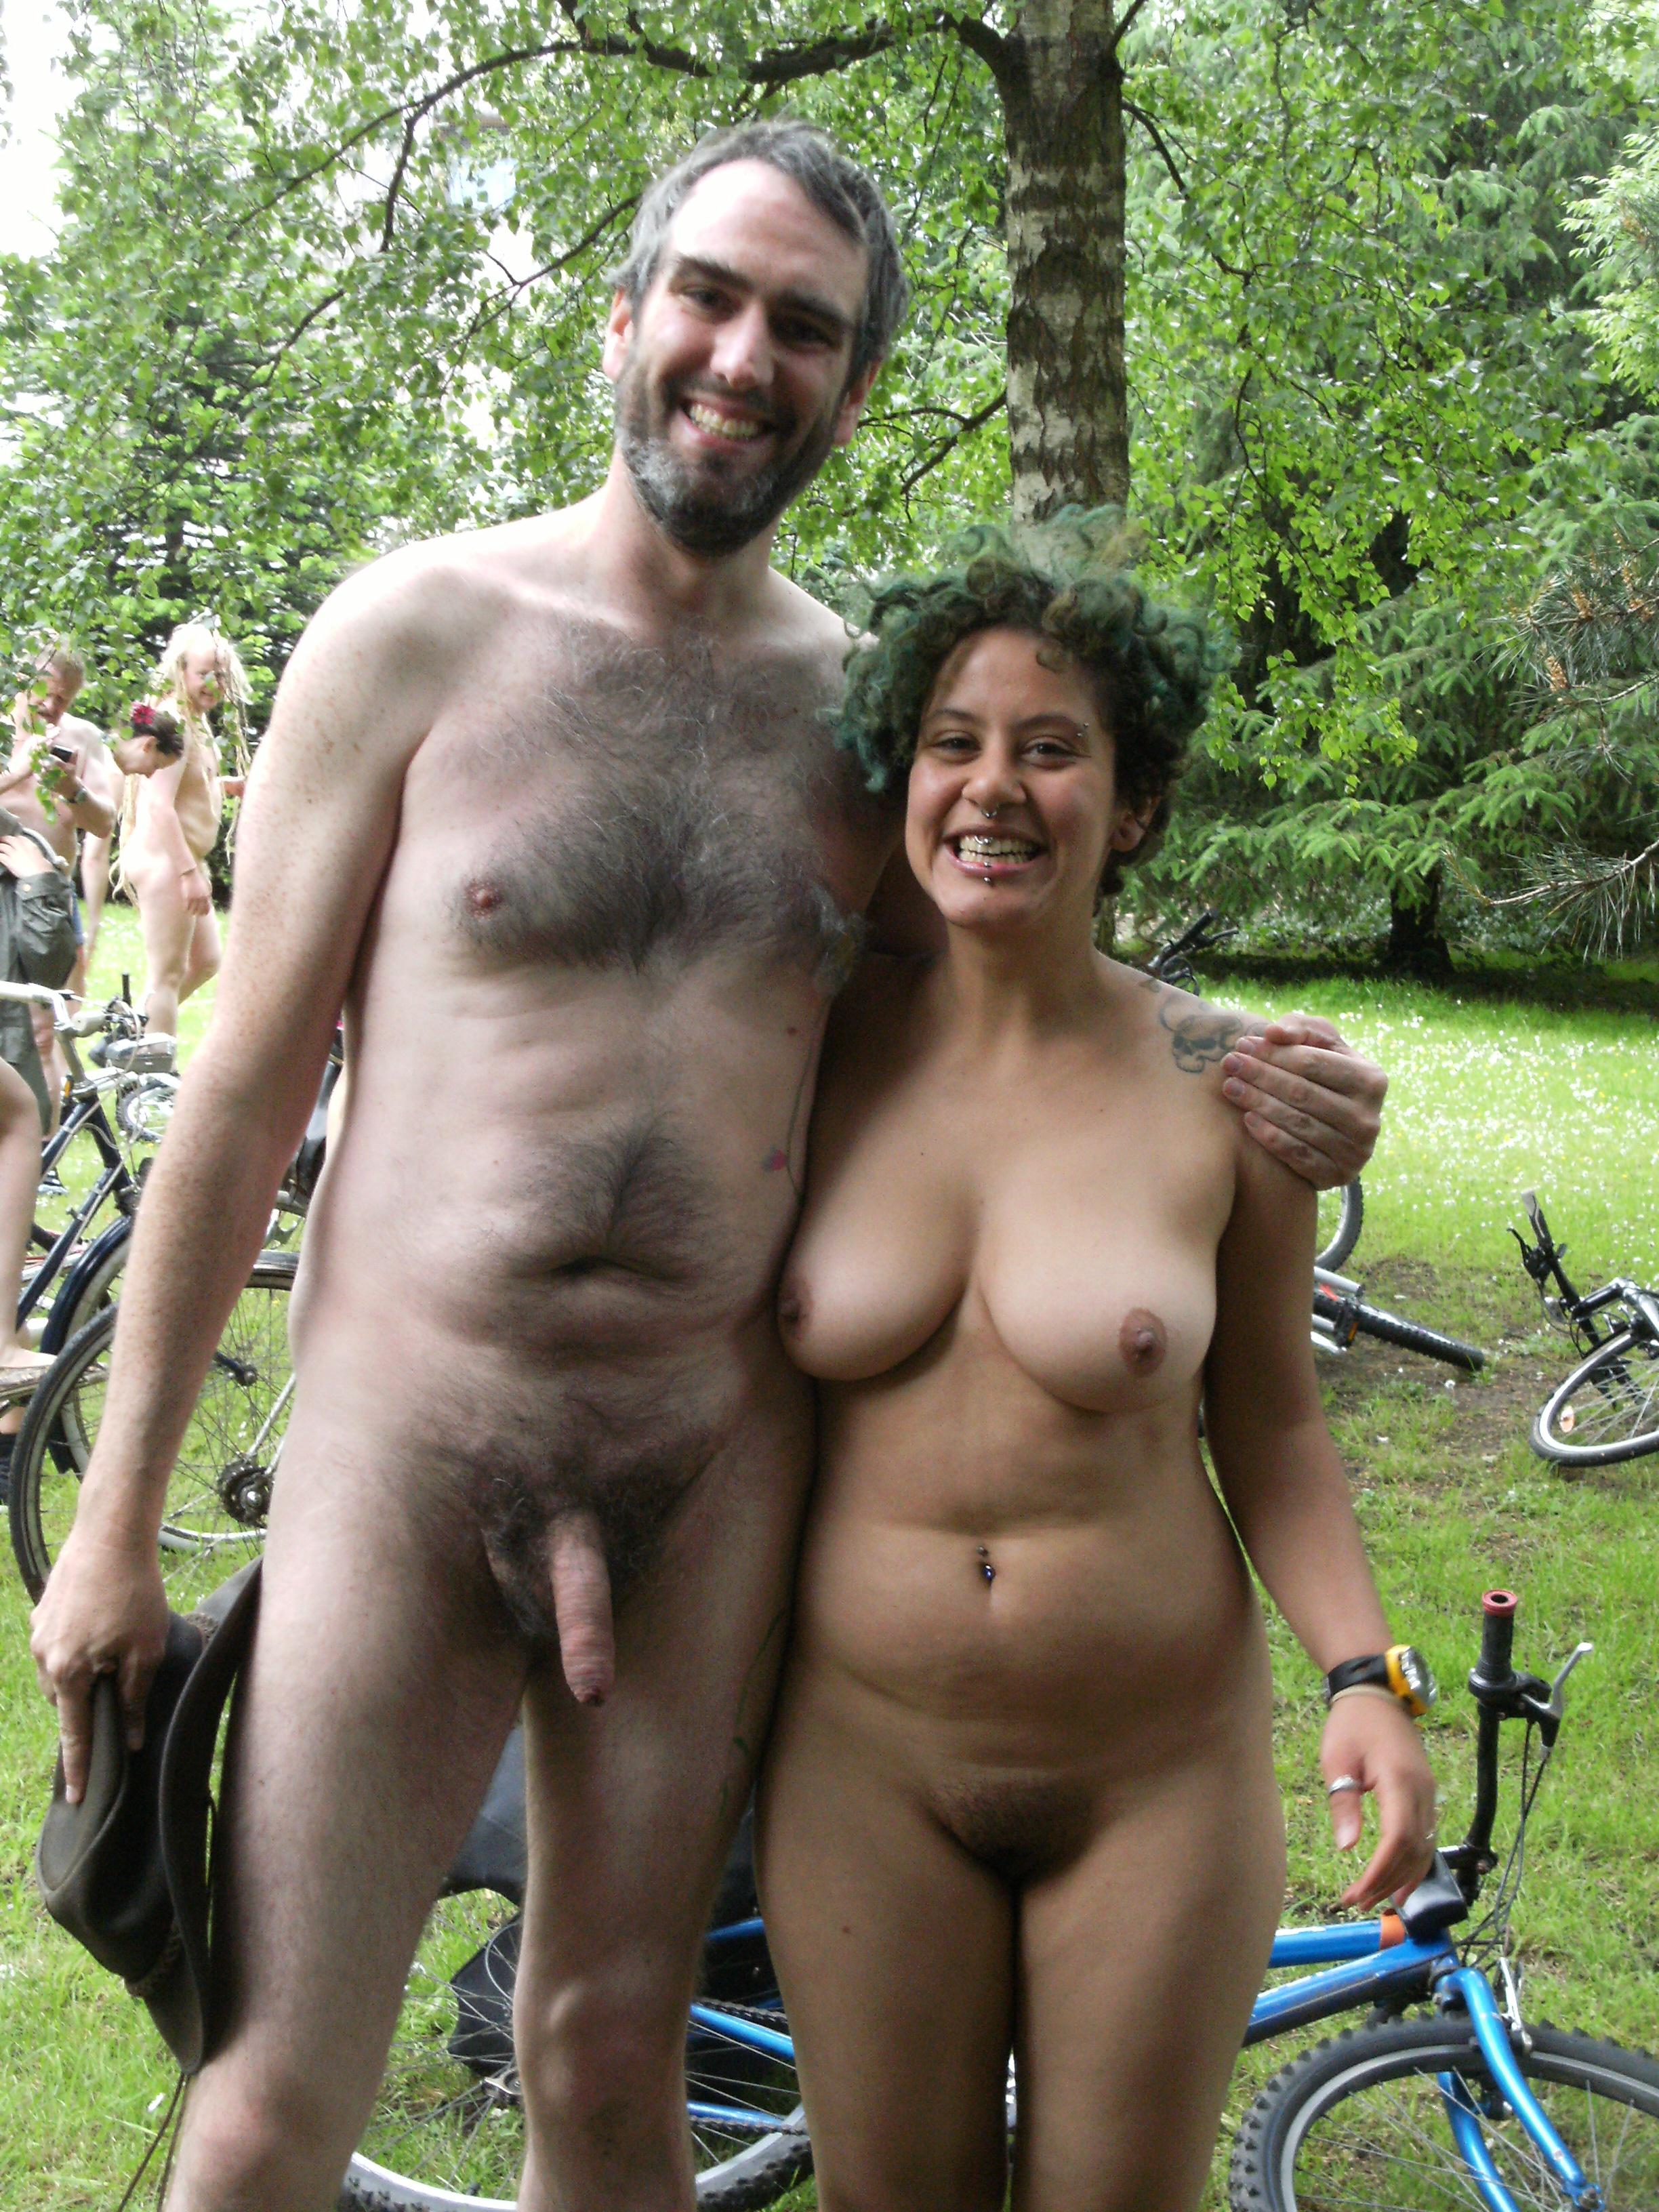 Naked bike ride women